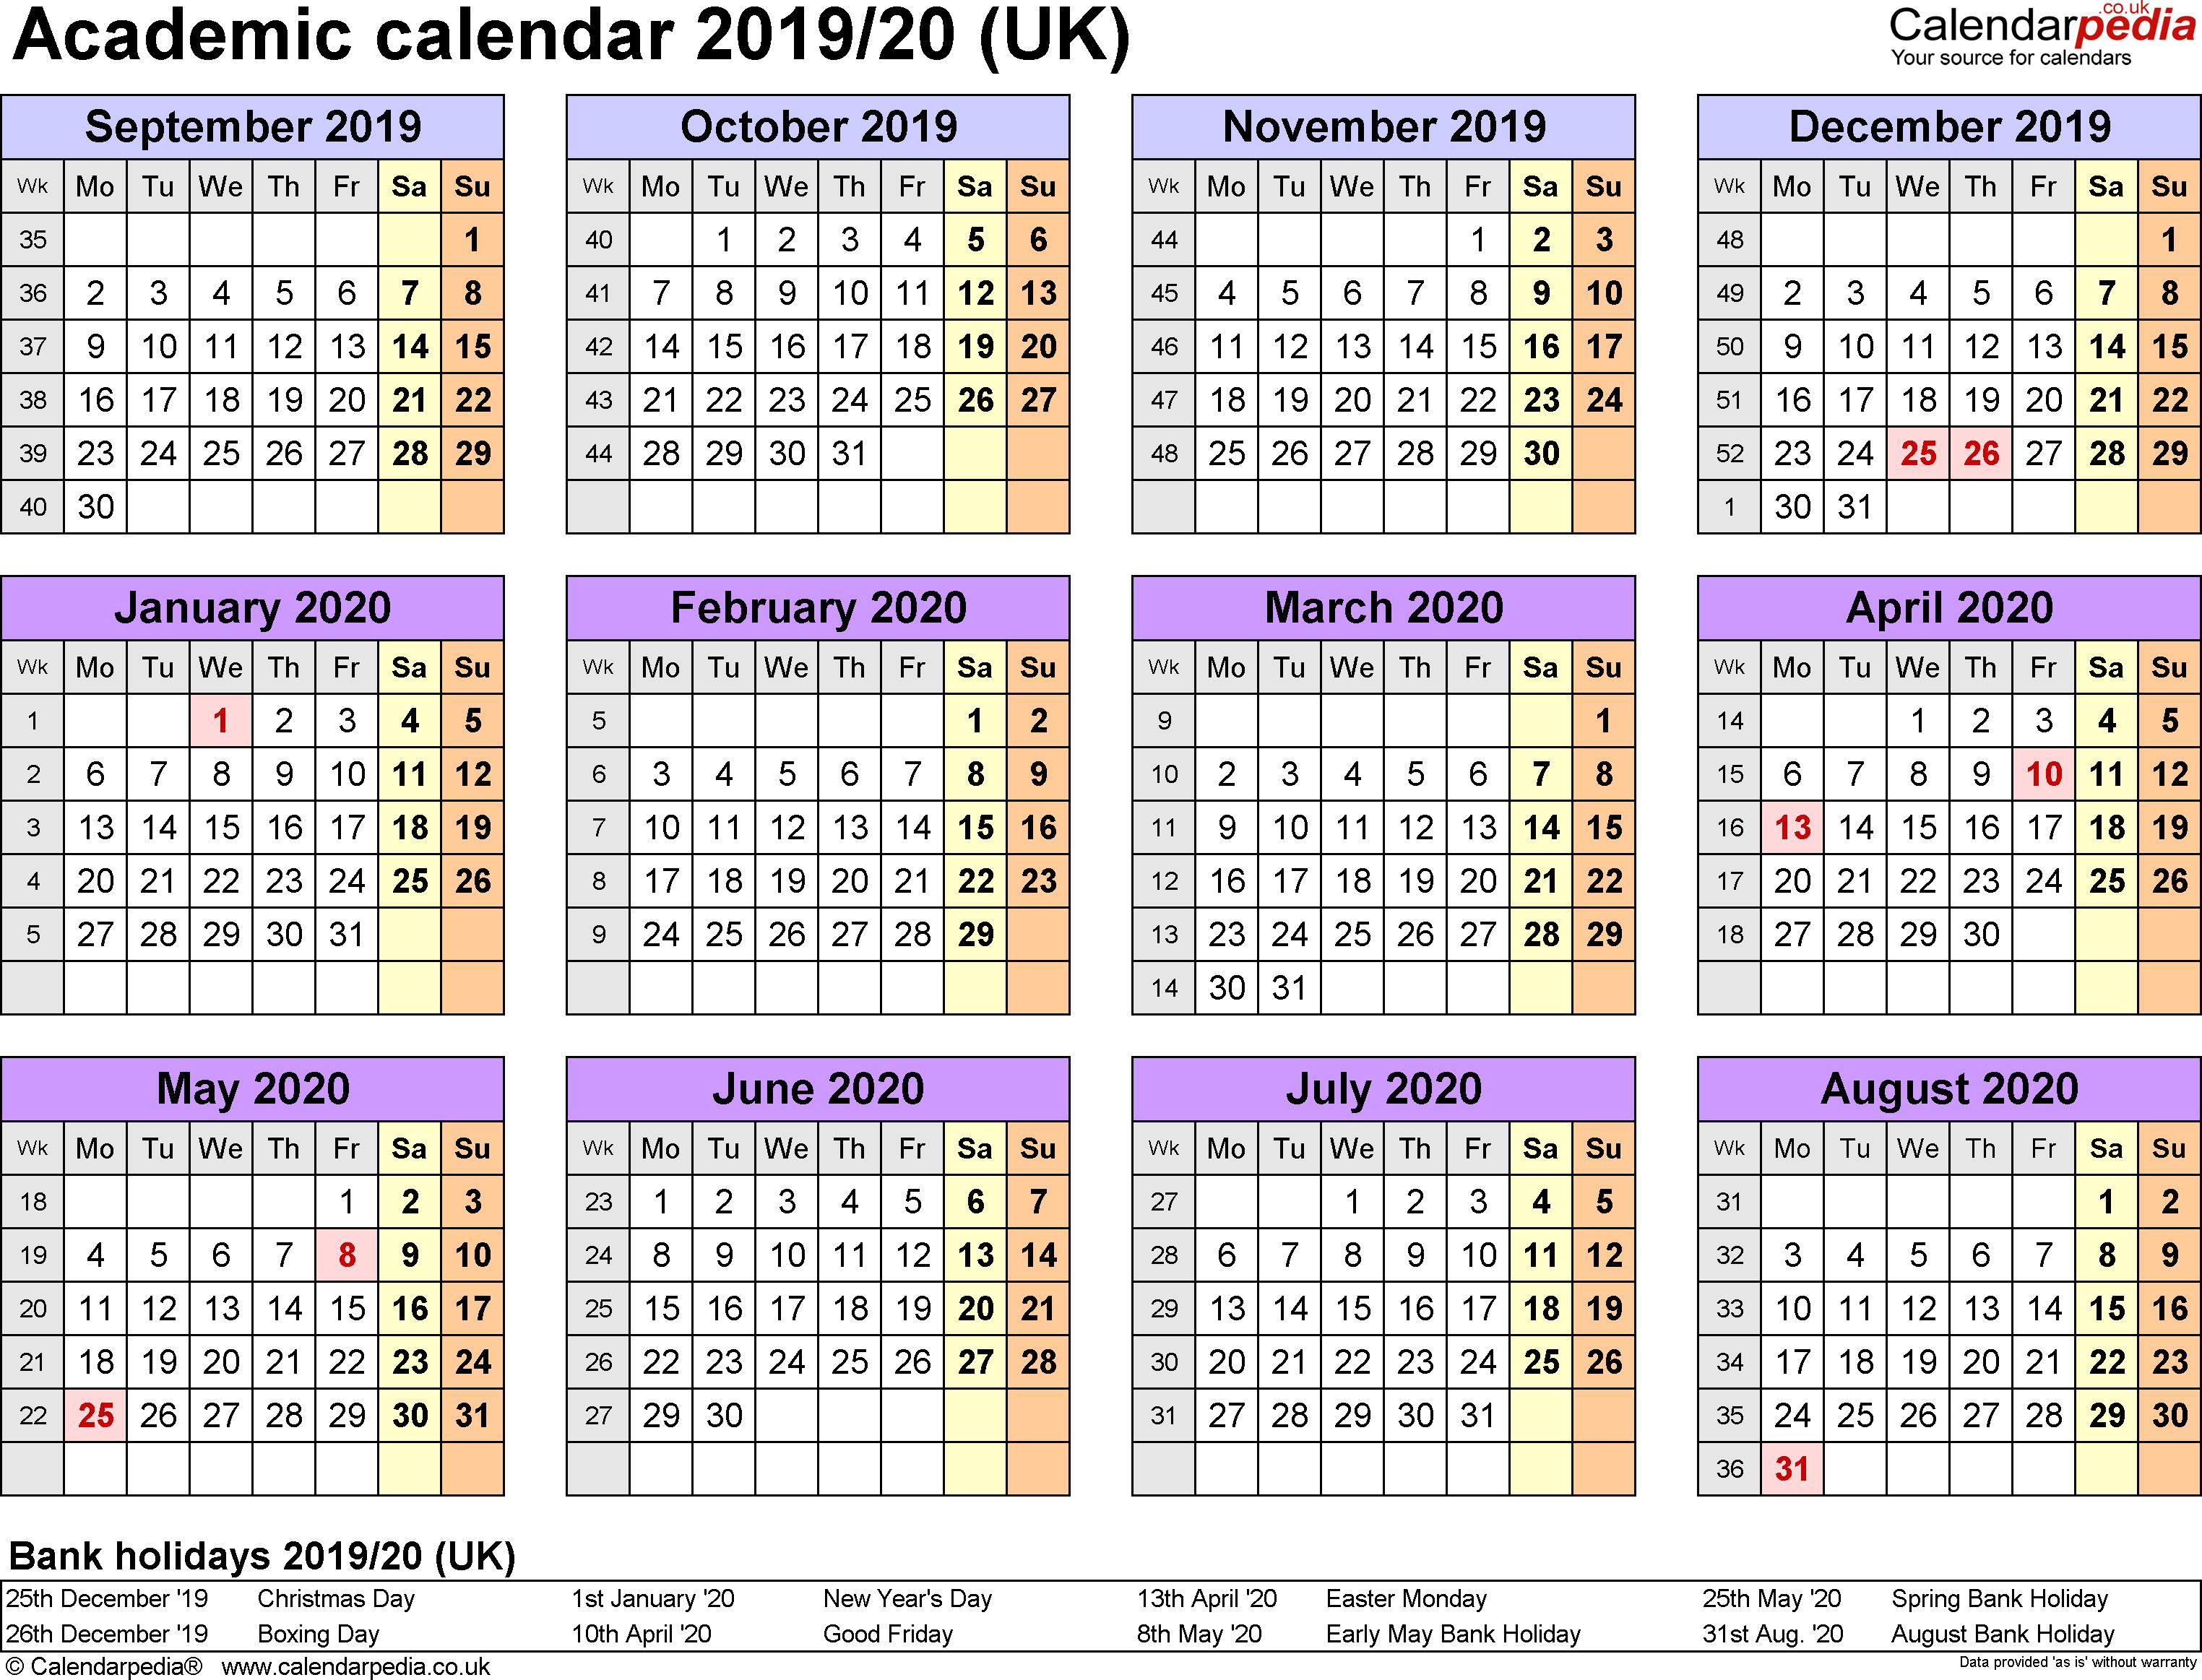 Academic Calendars 2019/2020 As Free Printable Word Templates U Of L Calendar 2019